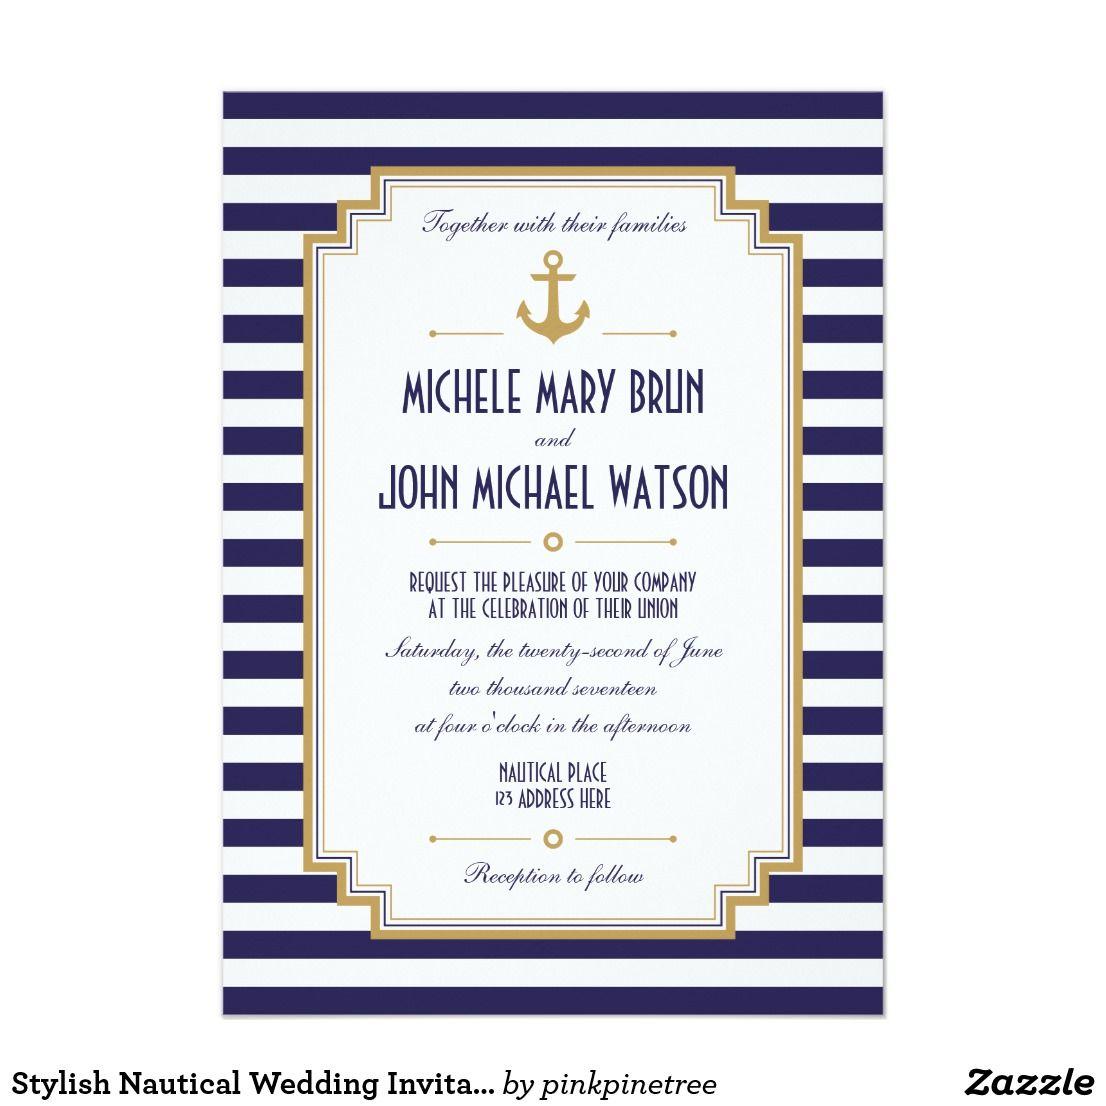 Stylish Nautical Wedding Invitation Beach Wedding Invitation